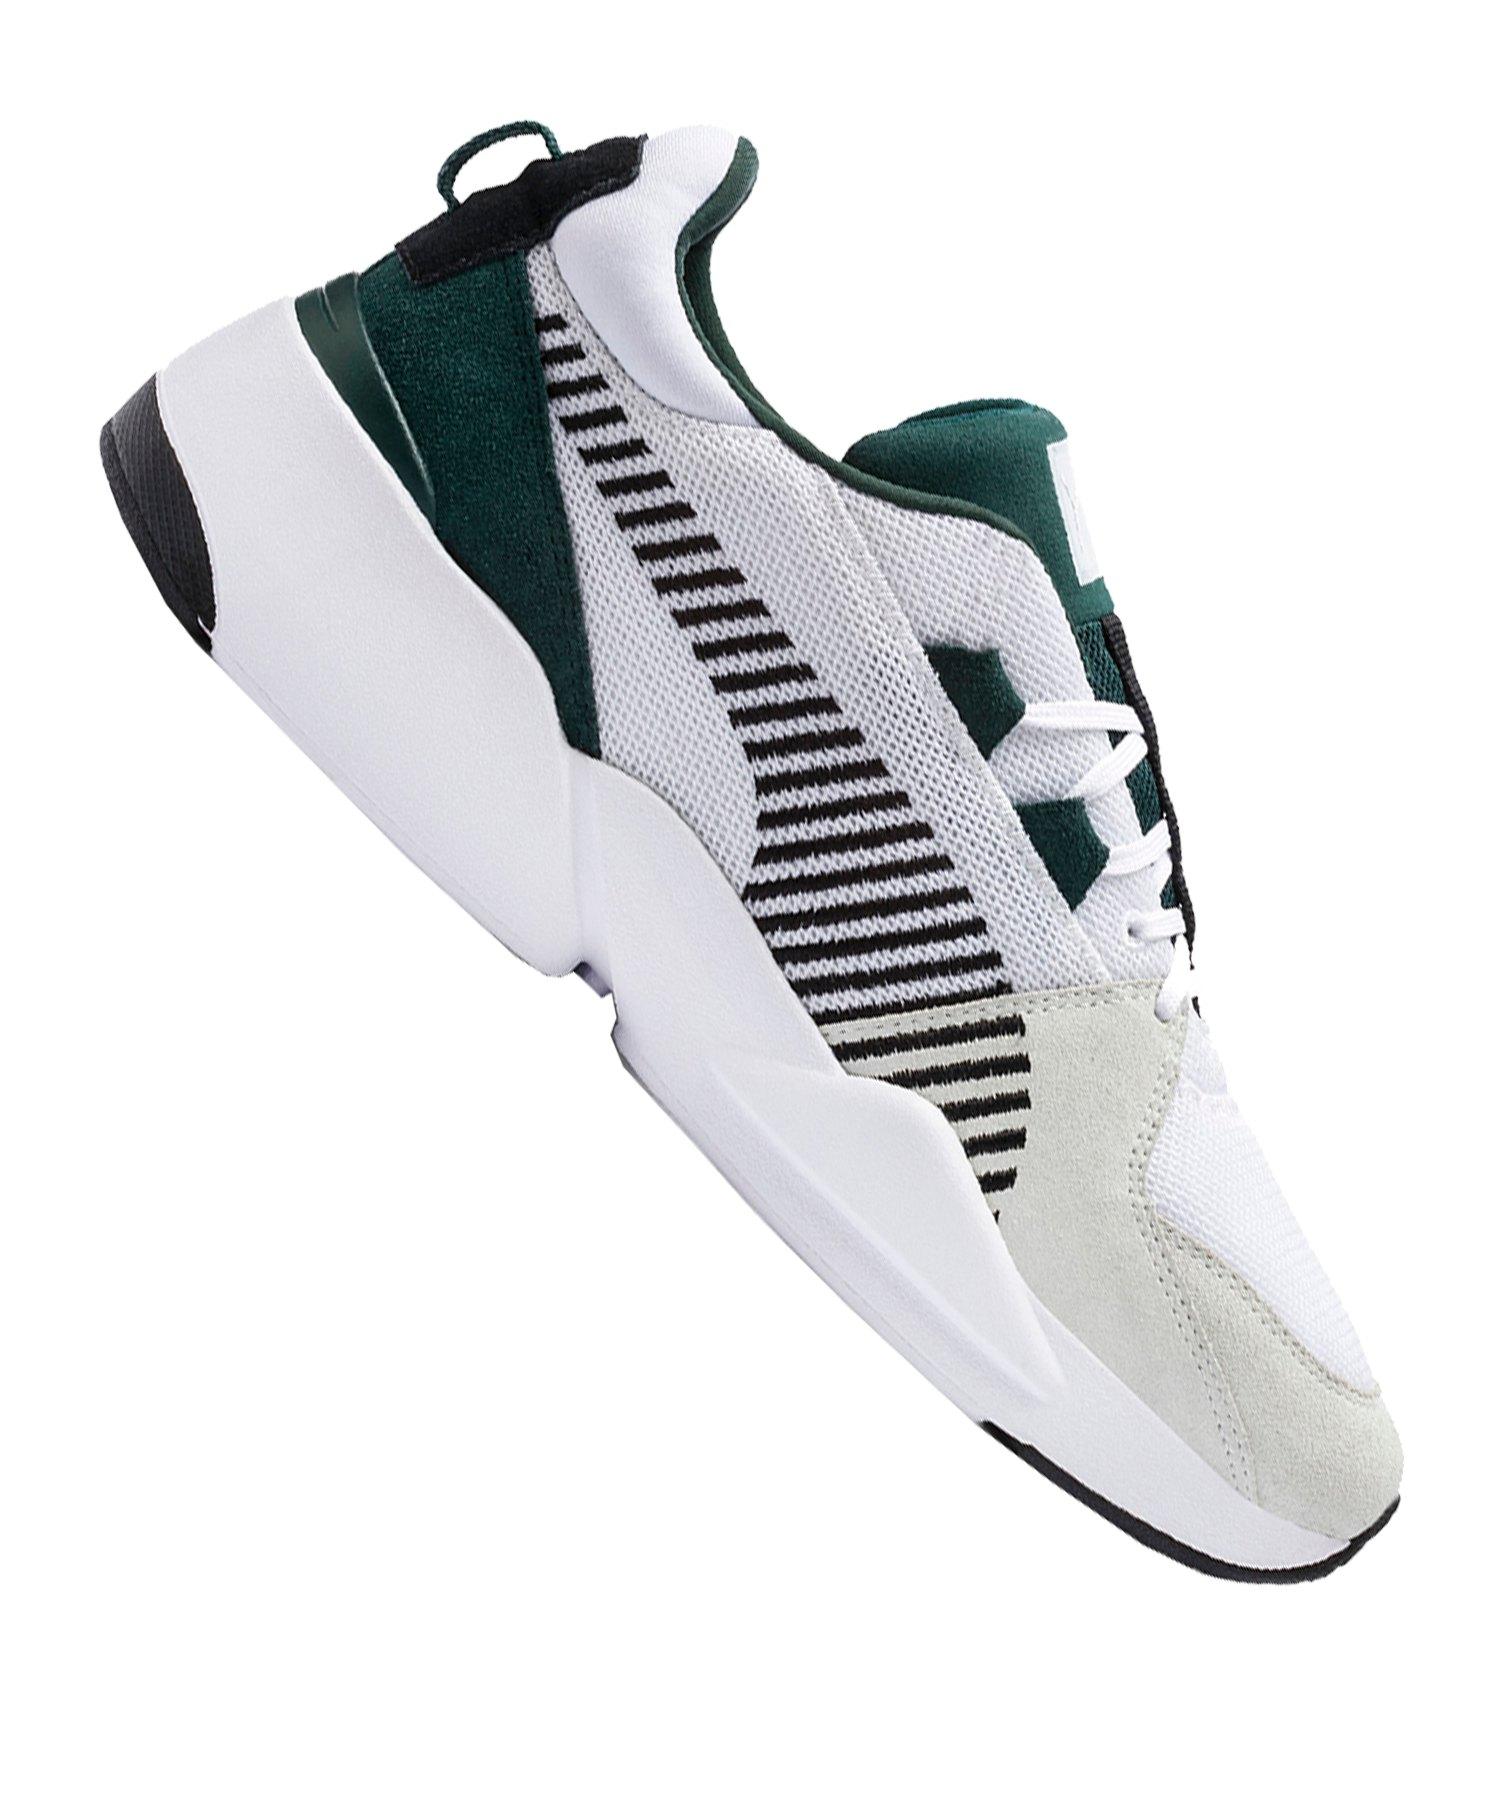 7yf6bgy Suede Weiss Sneaker Puma Zeta Grün F03 lTcK1FJ